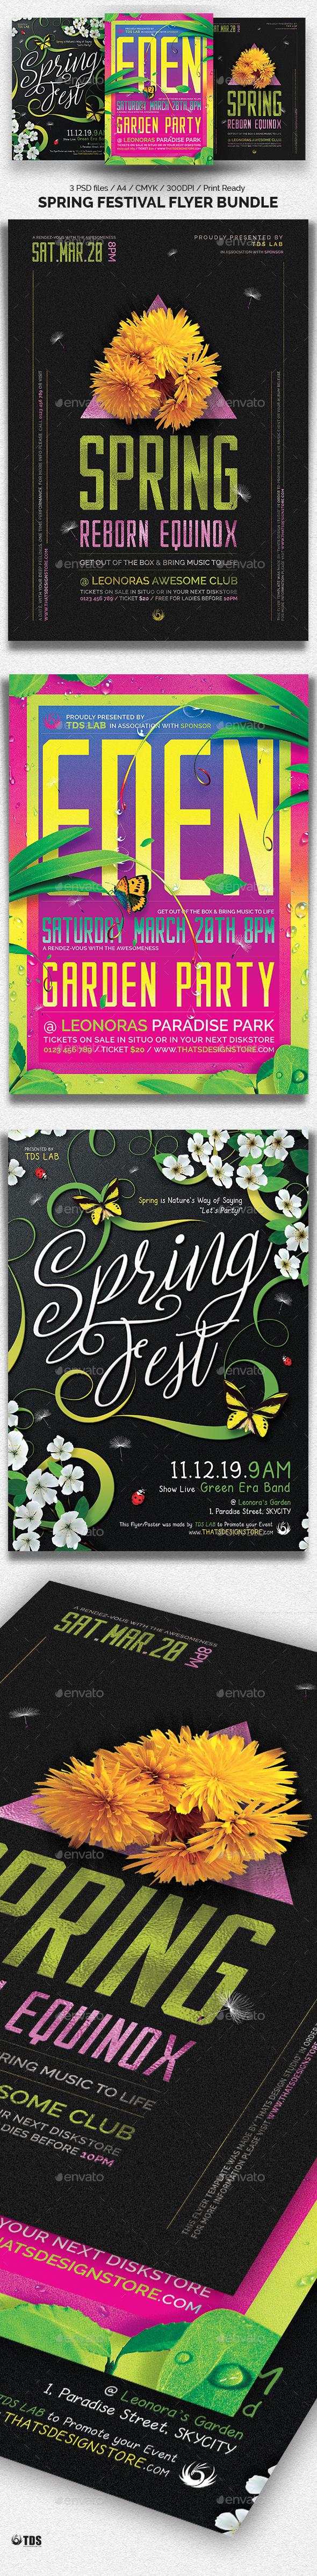 Spring Festival Flyer Bundle - Clubs & Parties Events